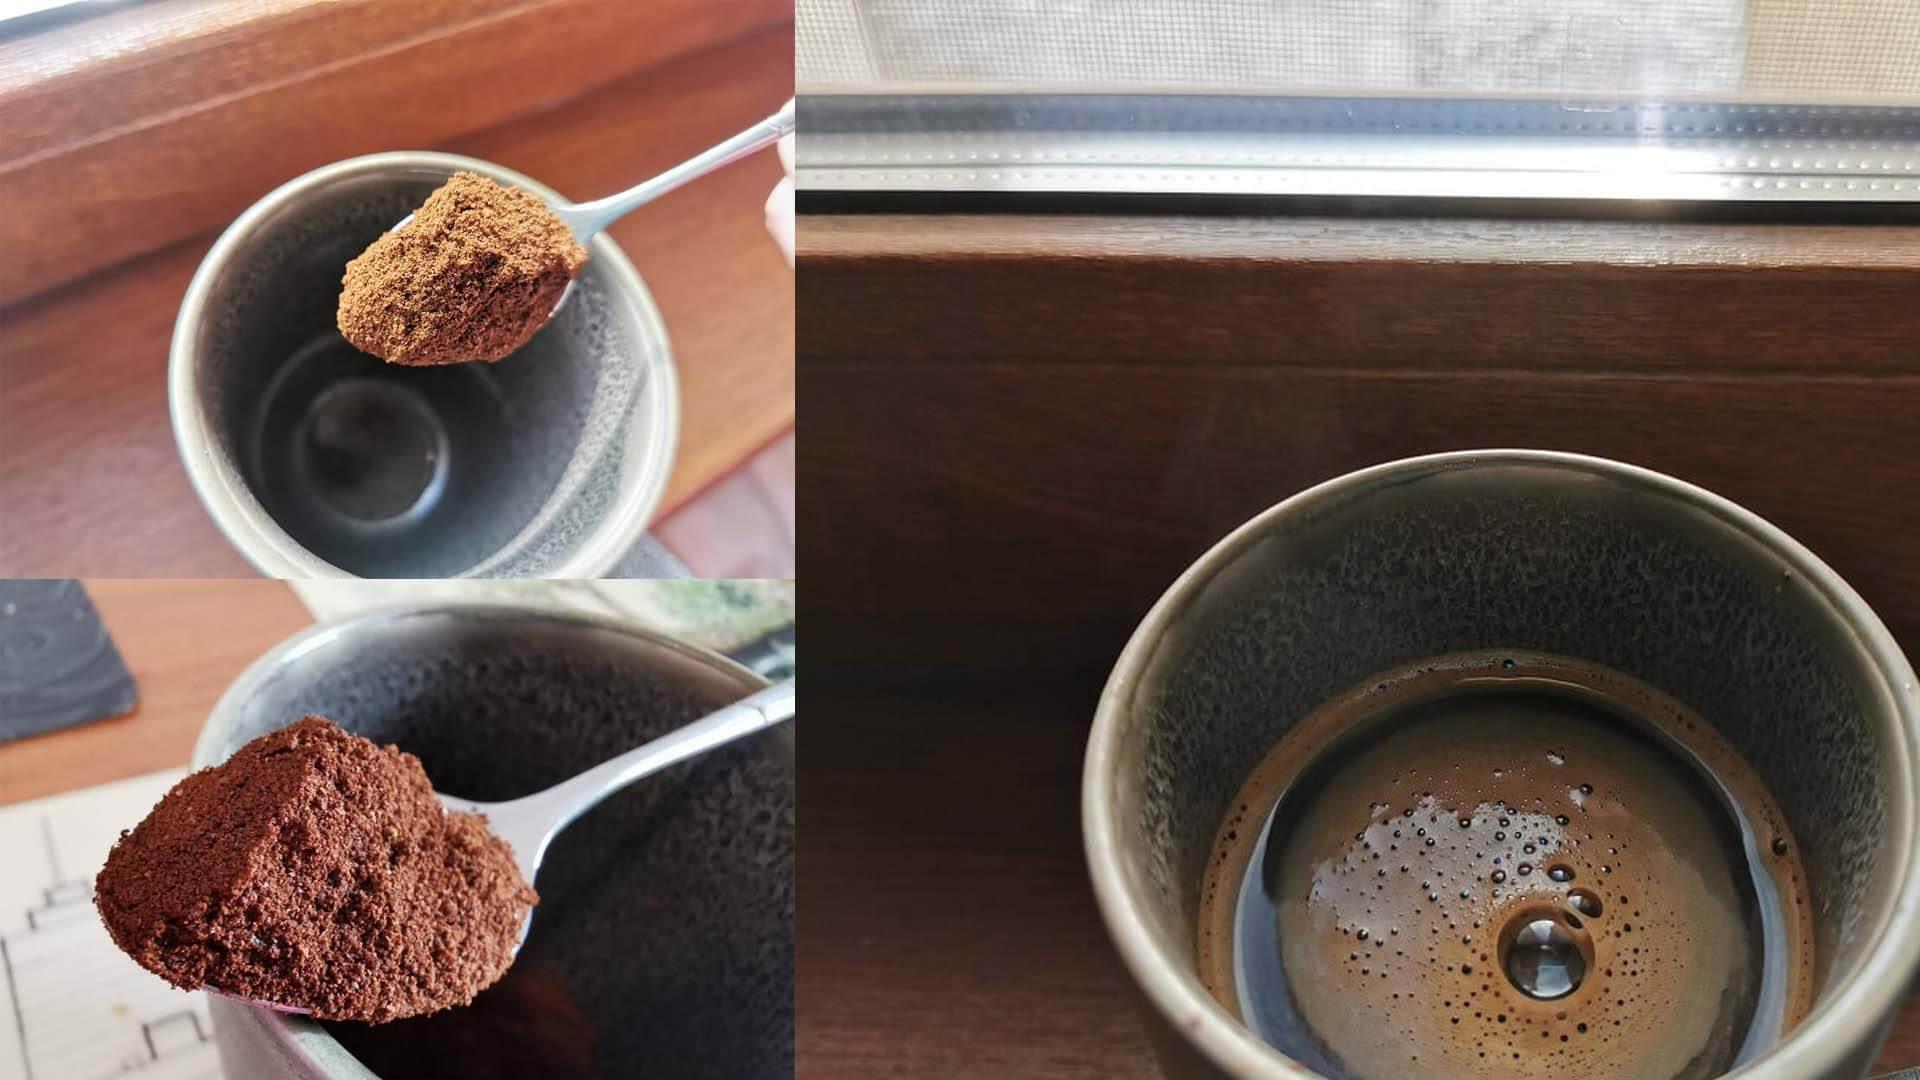 Recenzie cafea macinata decofeinizata de la Lavazza